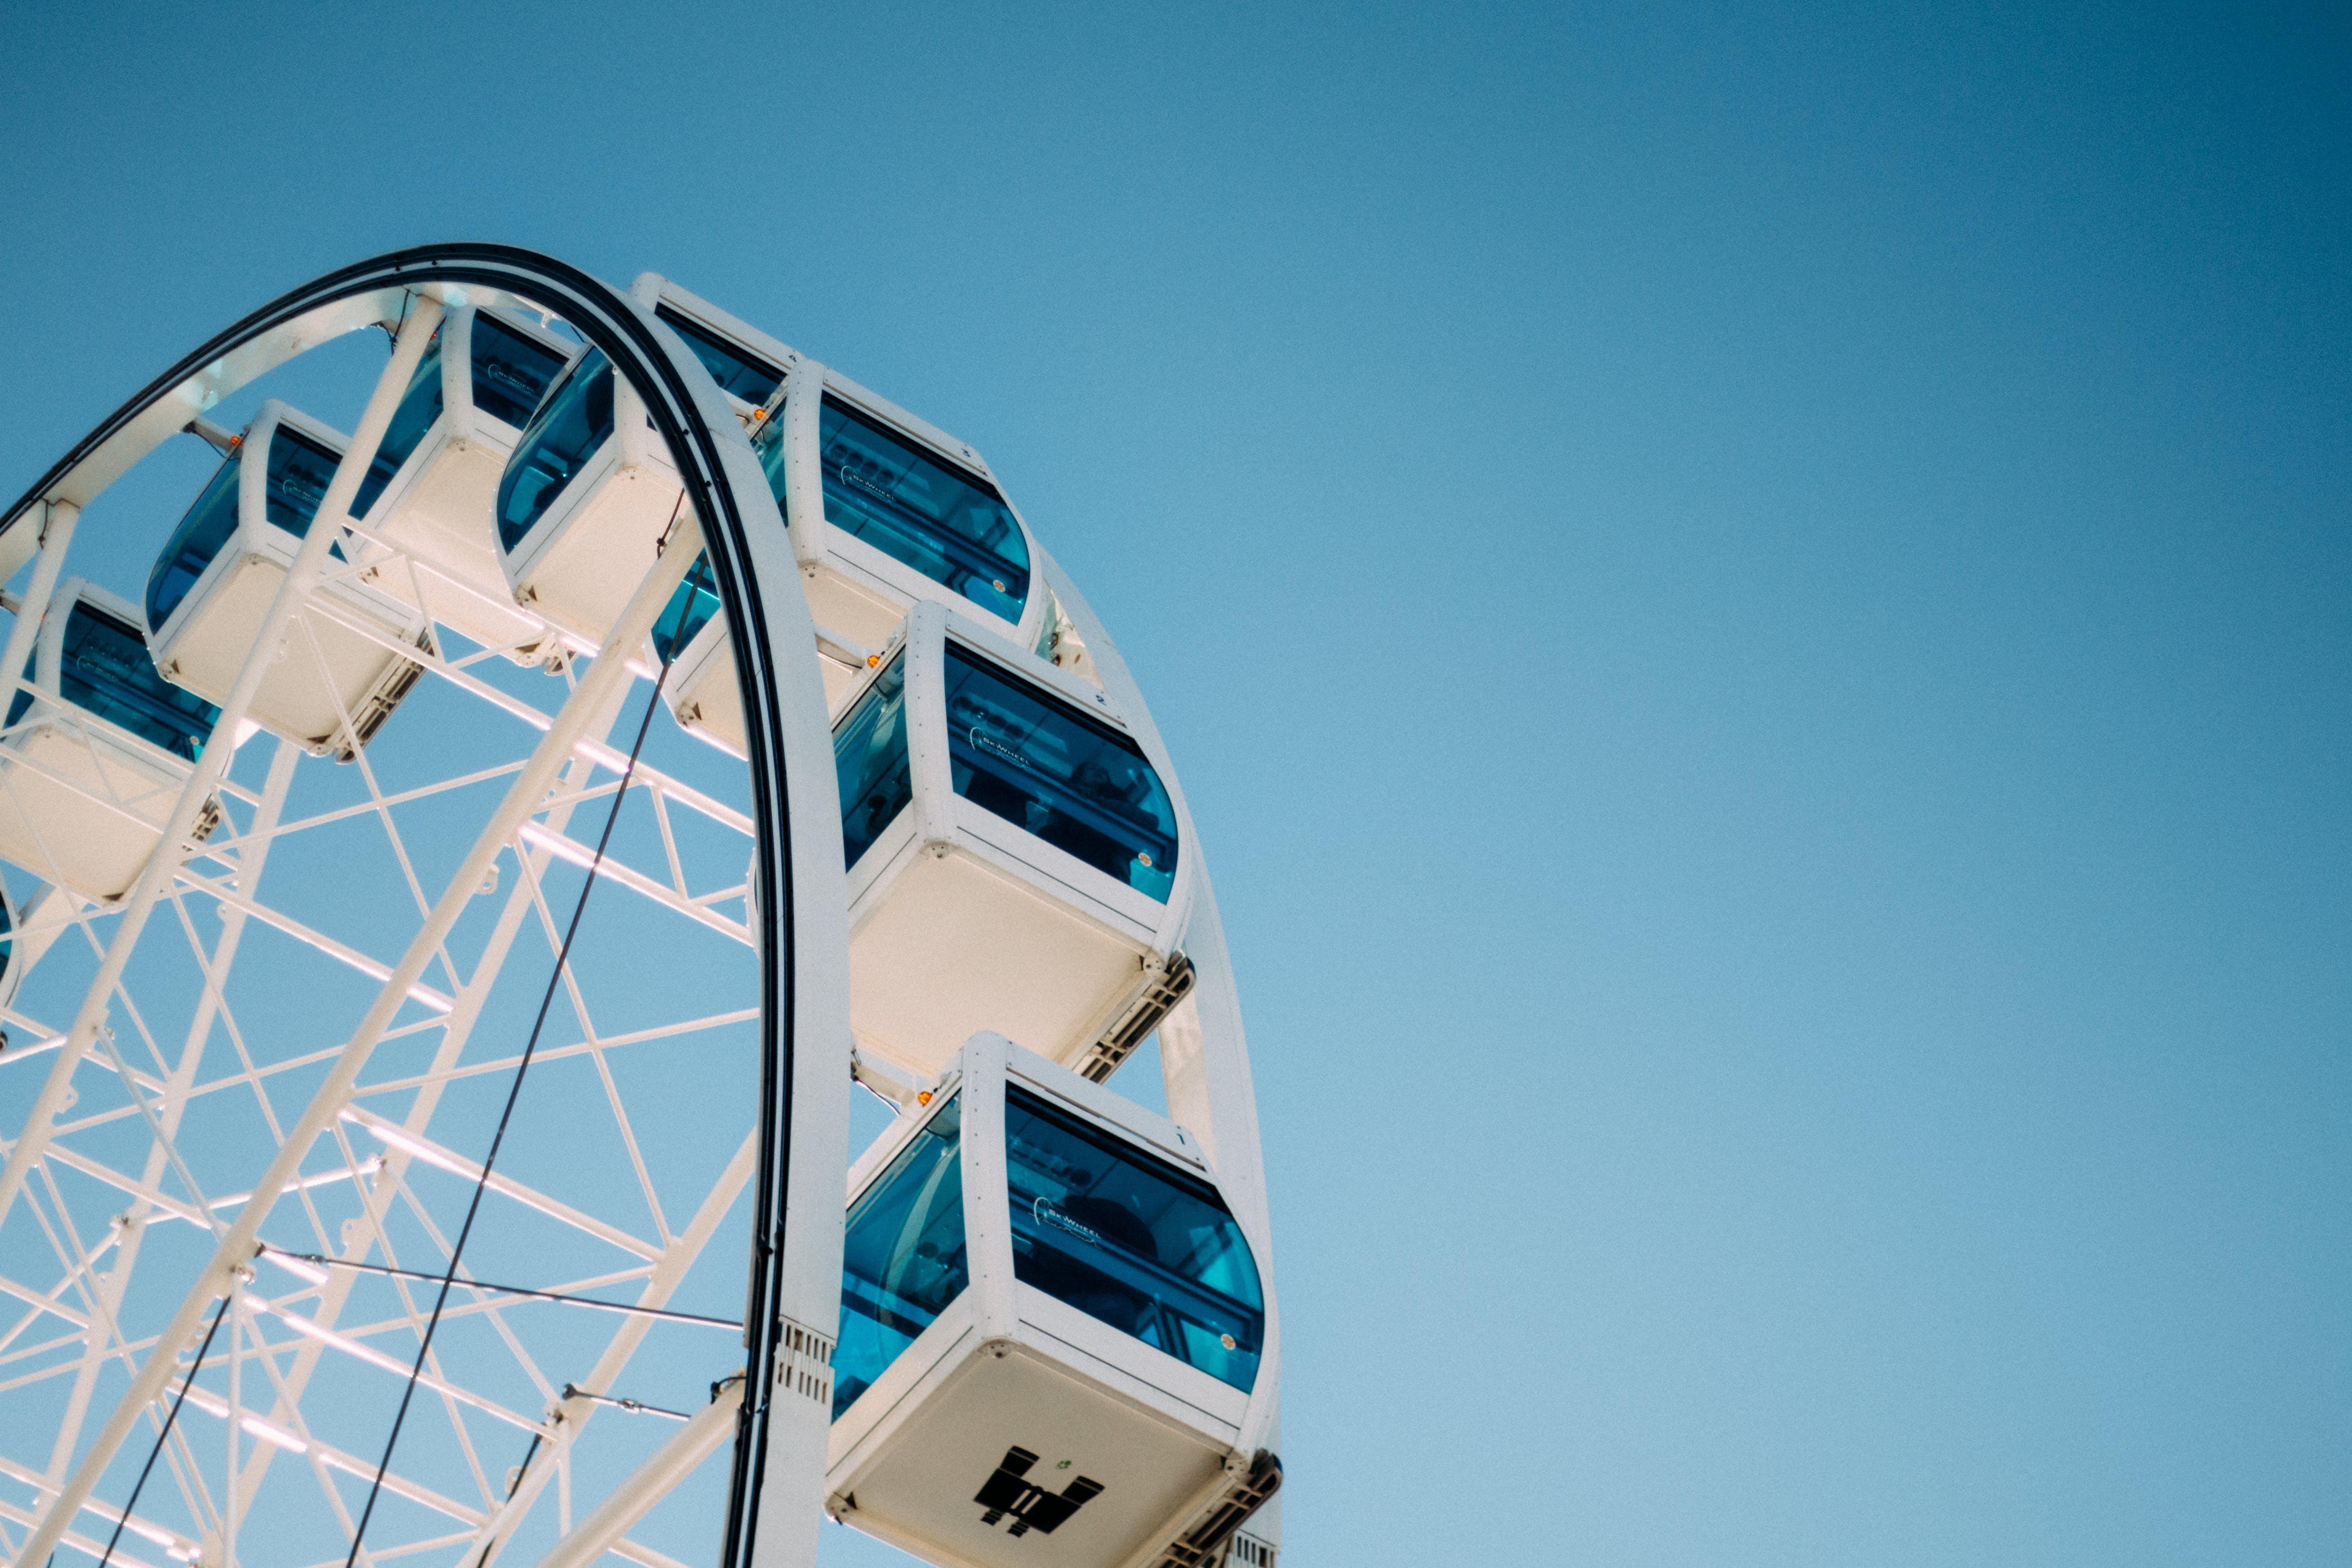 Blue and White Ferries Wheel Under Blue Skies